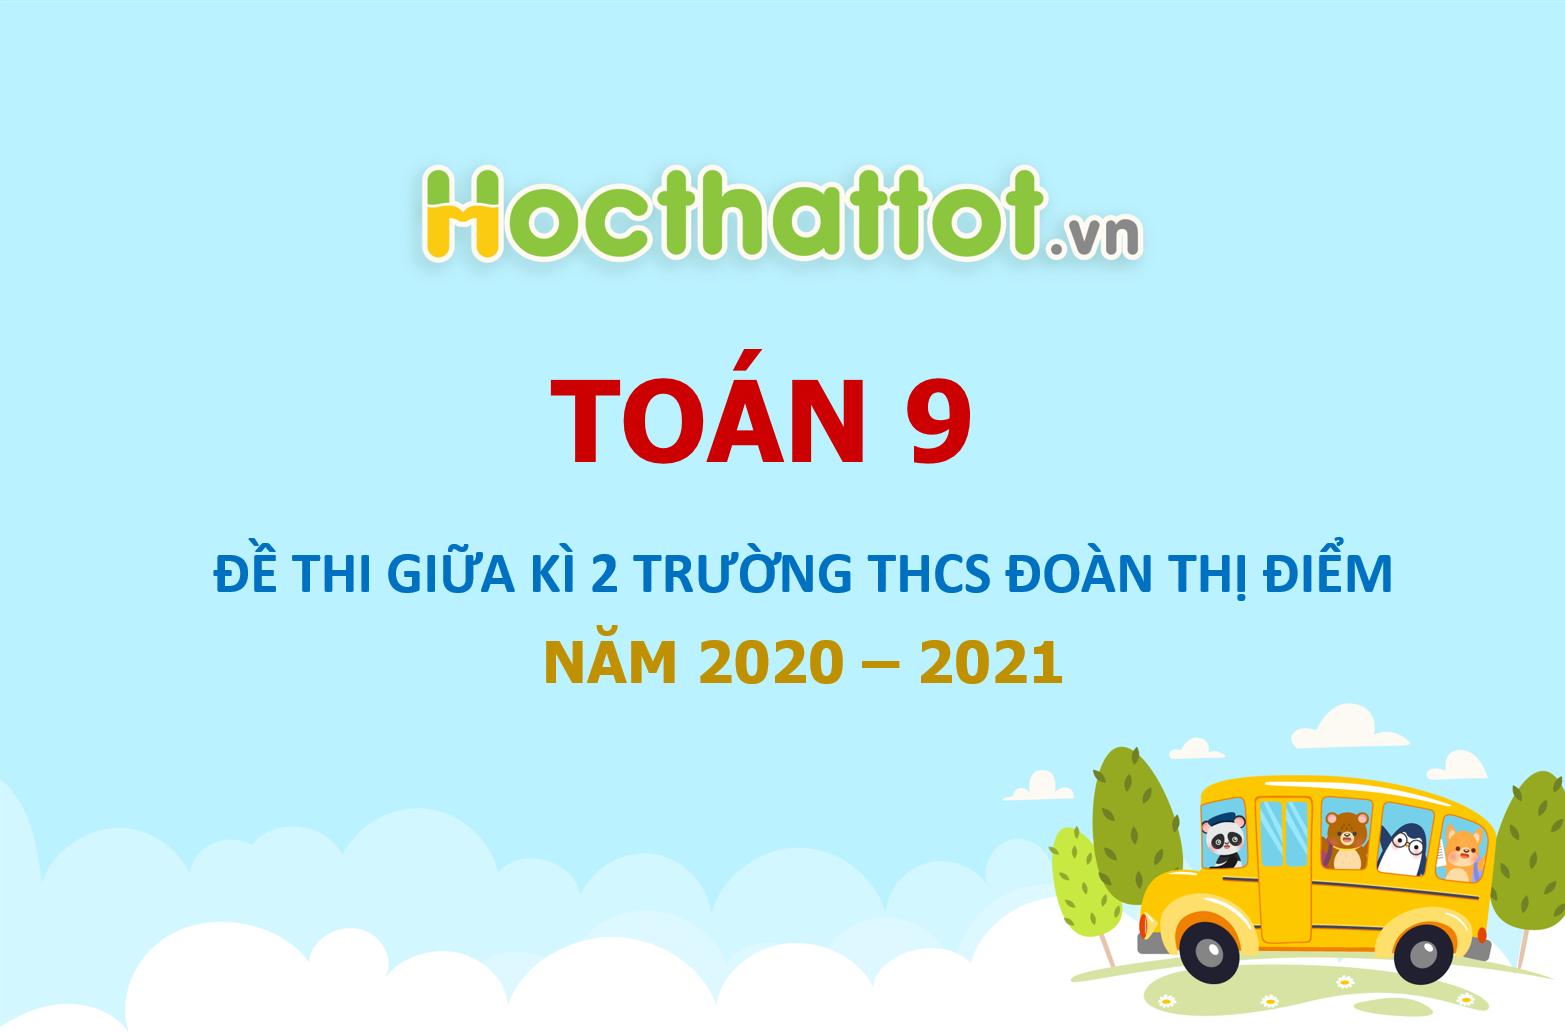 de-giua-ki-2-toan-9-nam-2020-2021-truong-thcs-doan-thi-diem-ha-noi